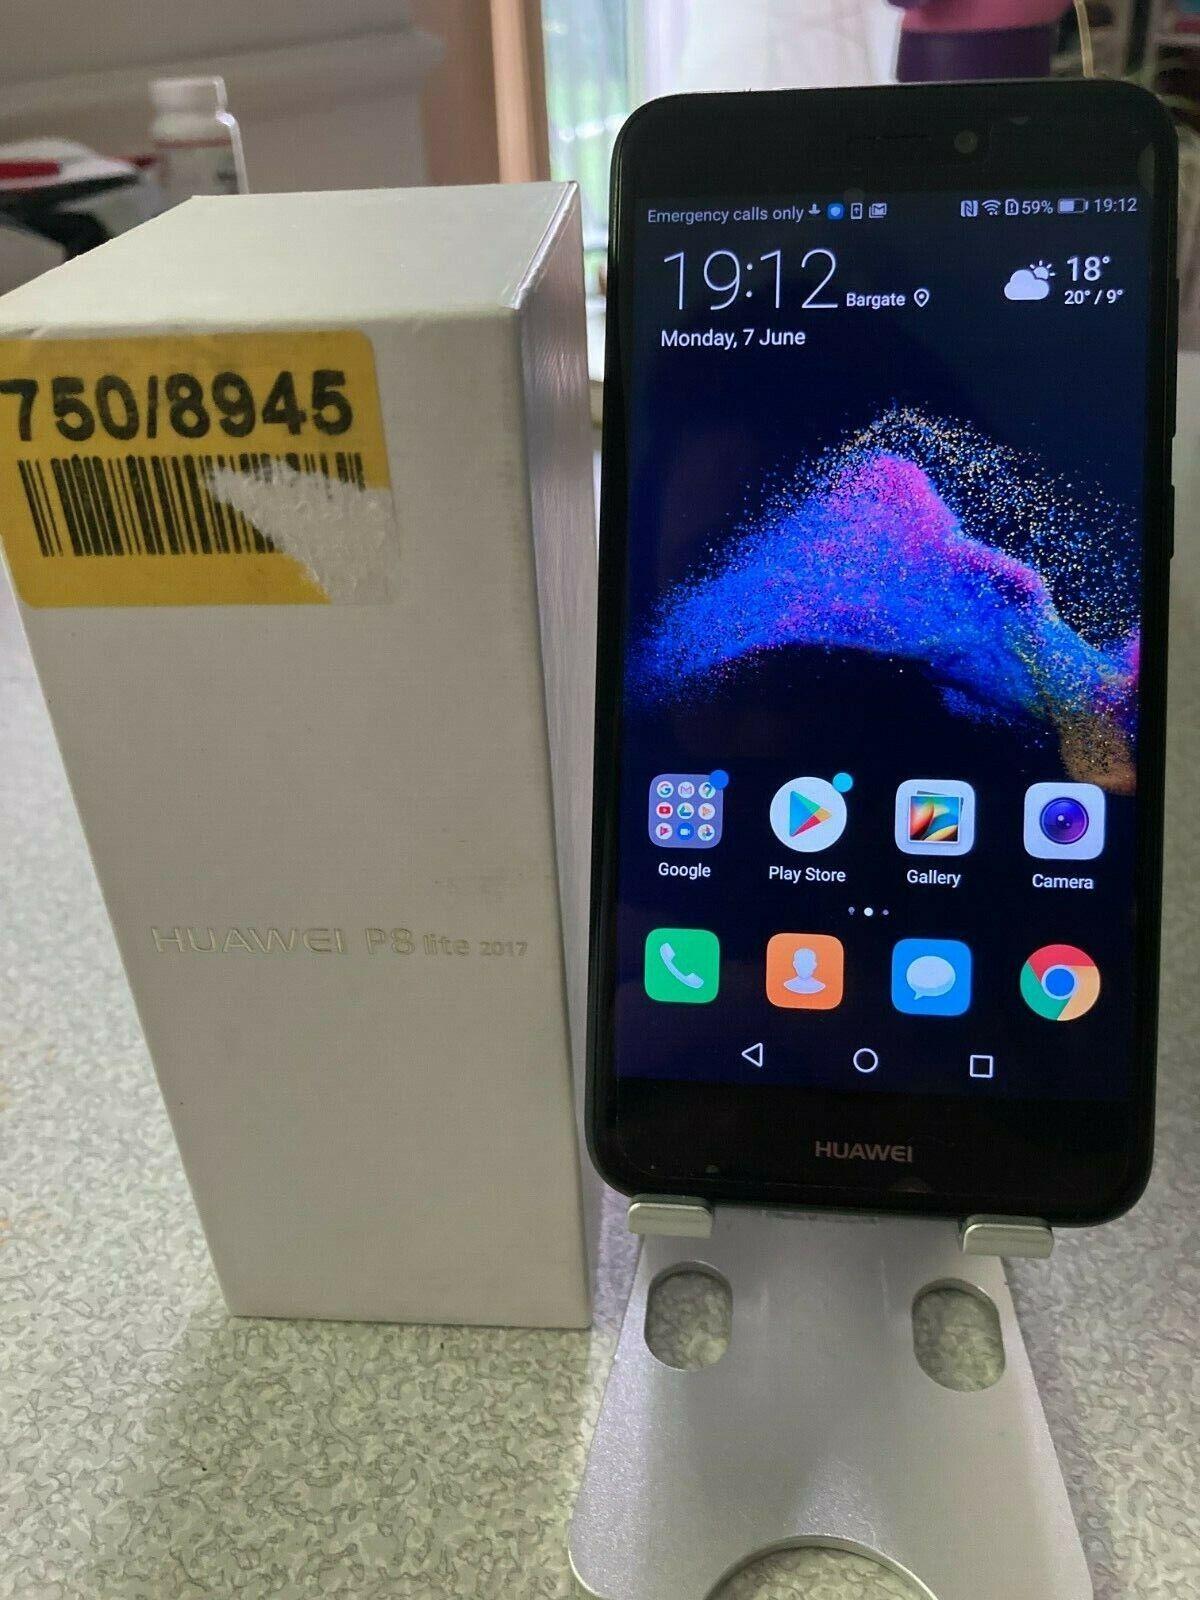 Android Phone - Huawei P8 Lite 2017 16GB Smartphone - Black mobile phone